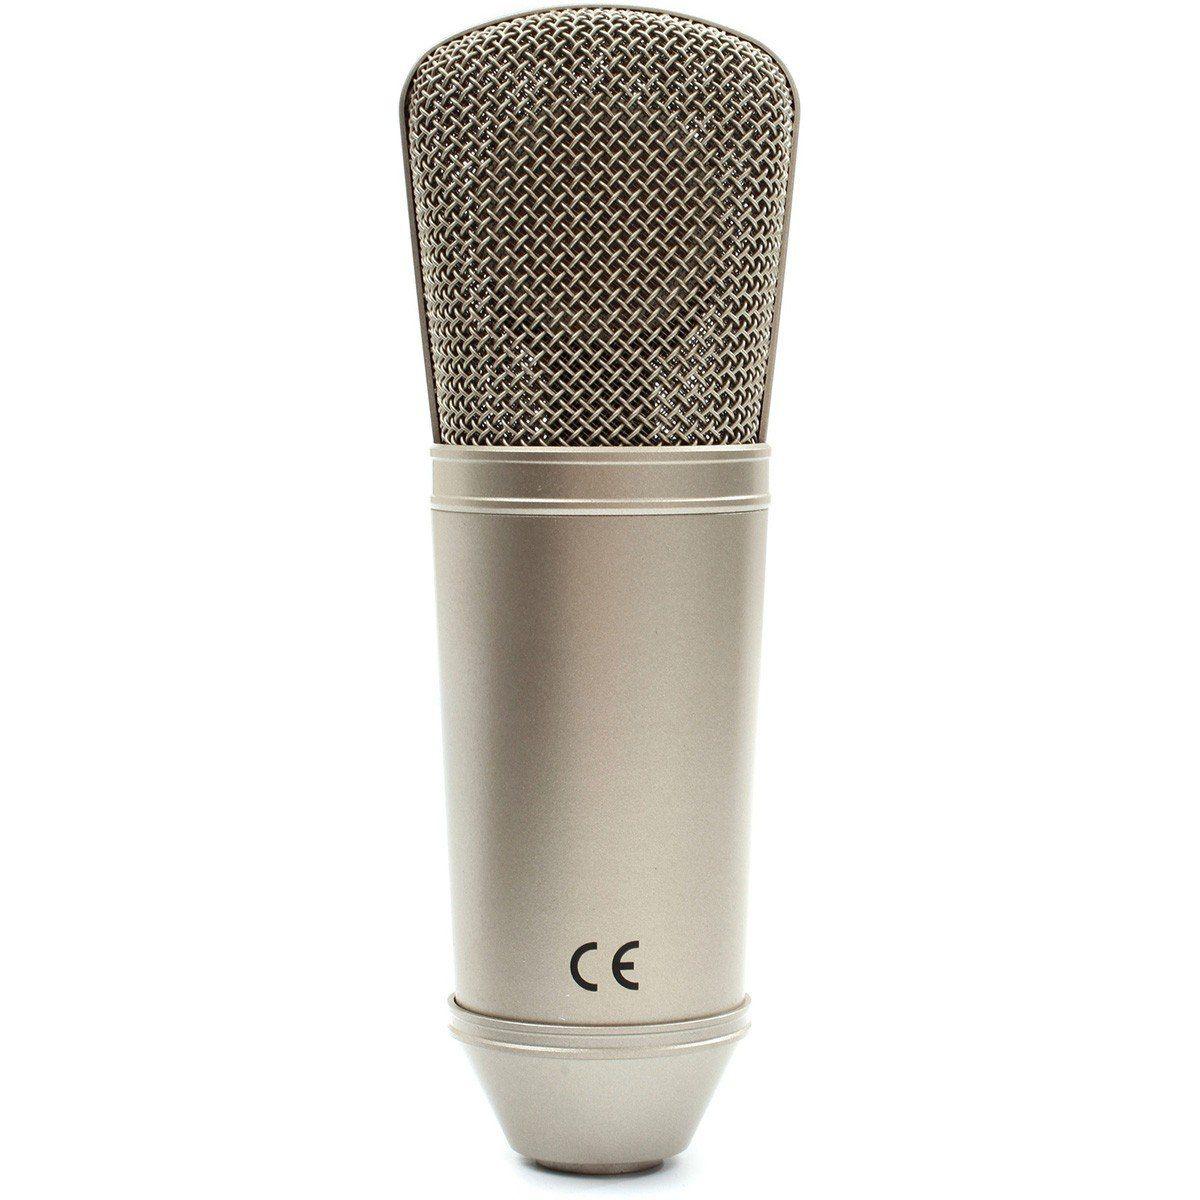 Behringer B1 Microfone Condensador Behringer B-1 Profissional para Estúdio